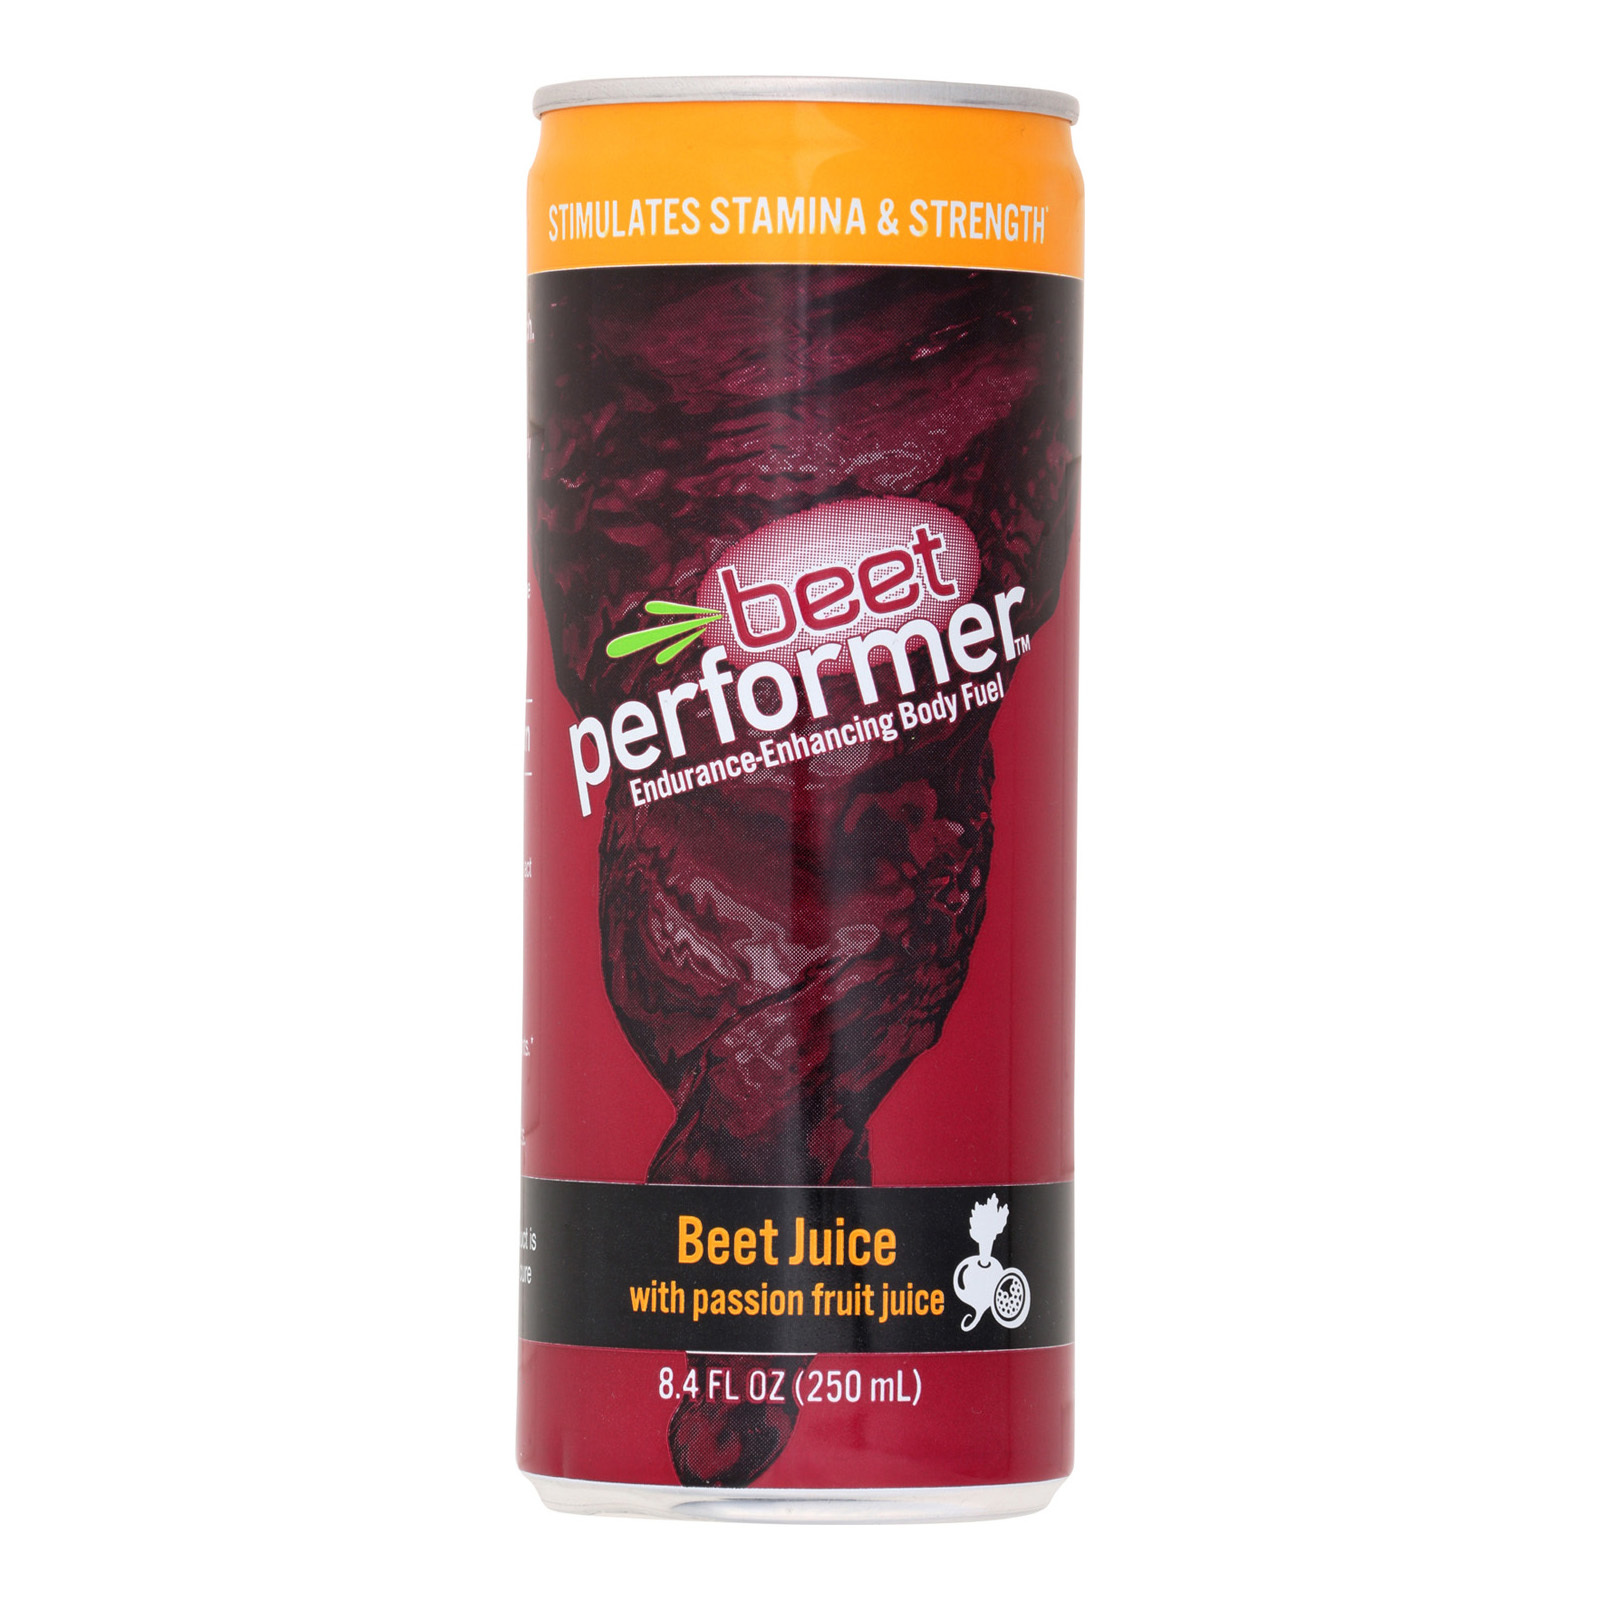 Beet Performer Beet Juice - Passion Fruit Juice - Case of 12 - 8.4 FL oz.